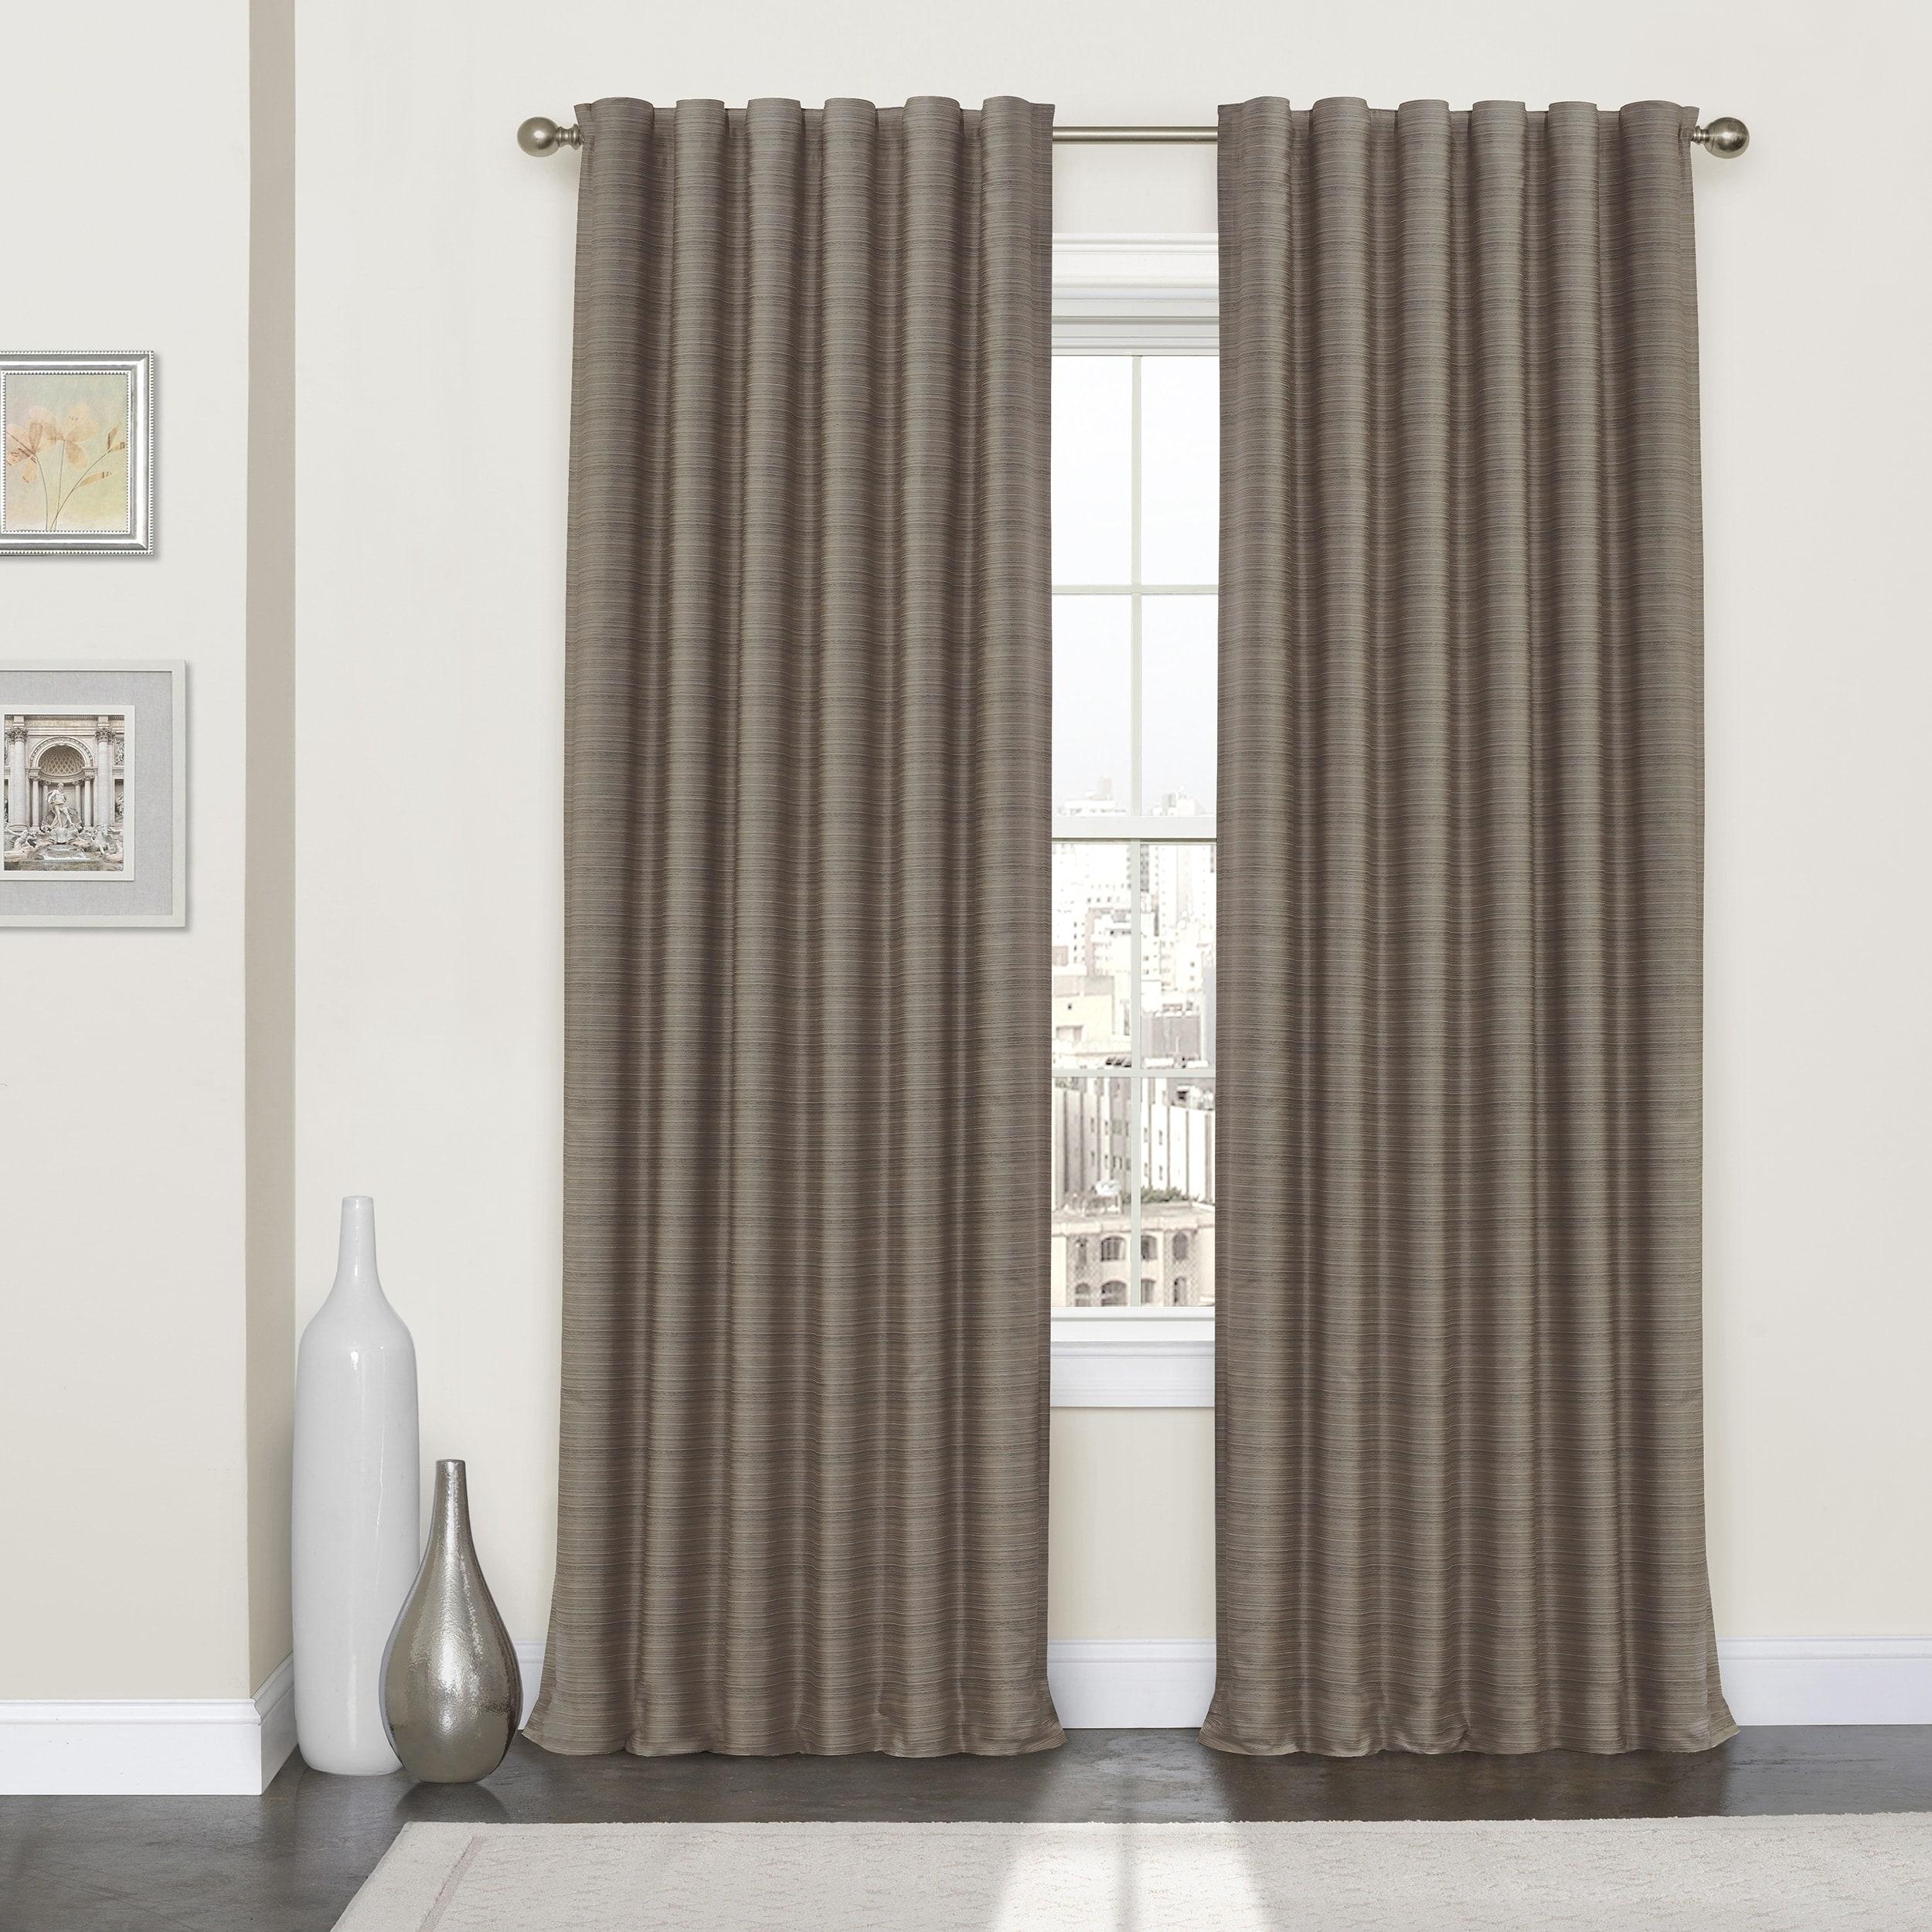 com curtain piece better gardens homes medallion curtains and panels set walmart ip panel